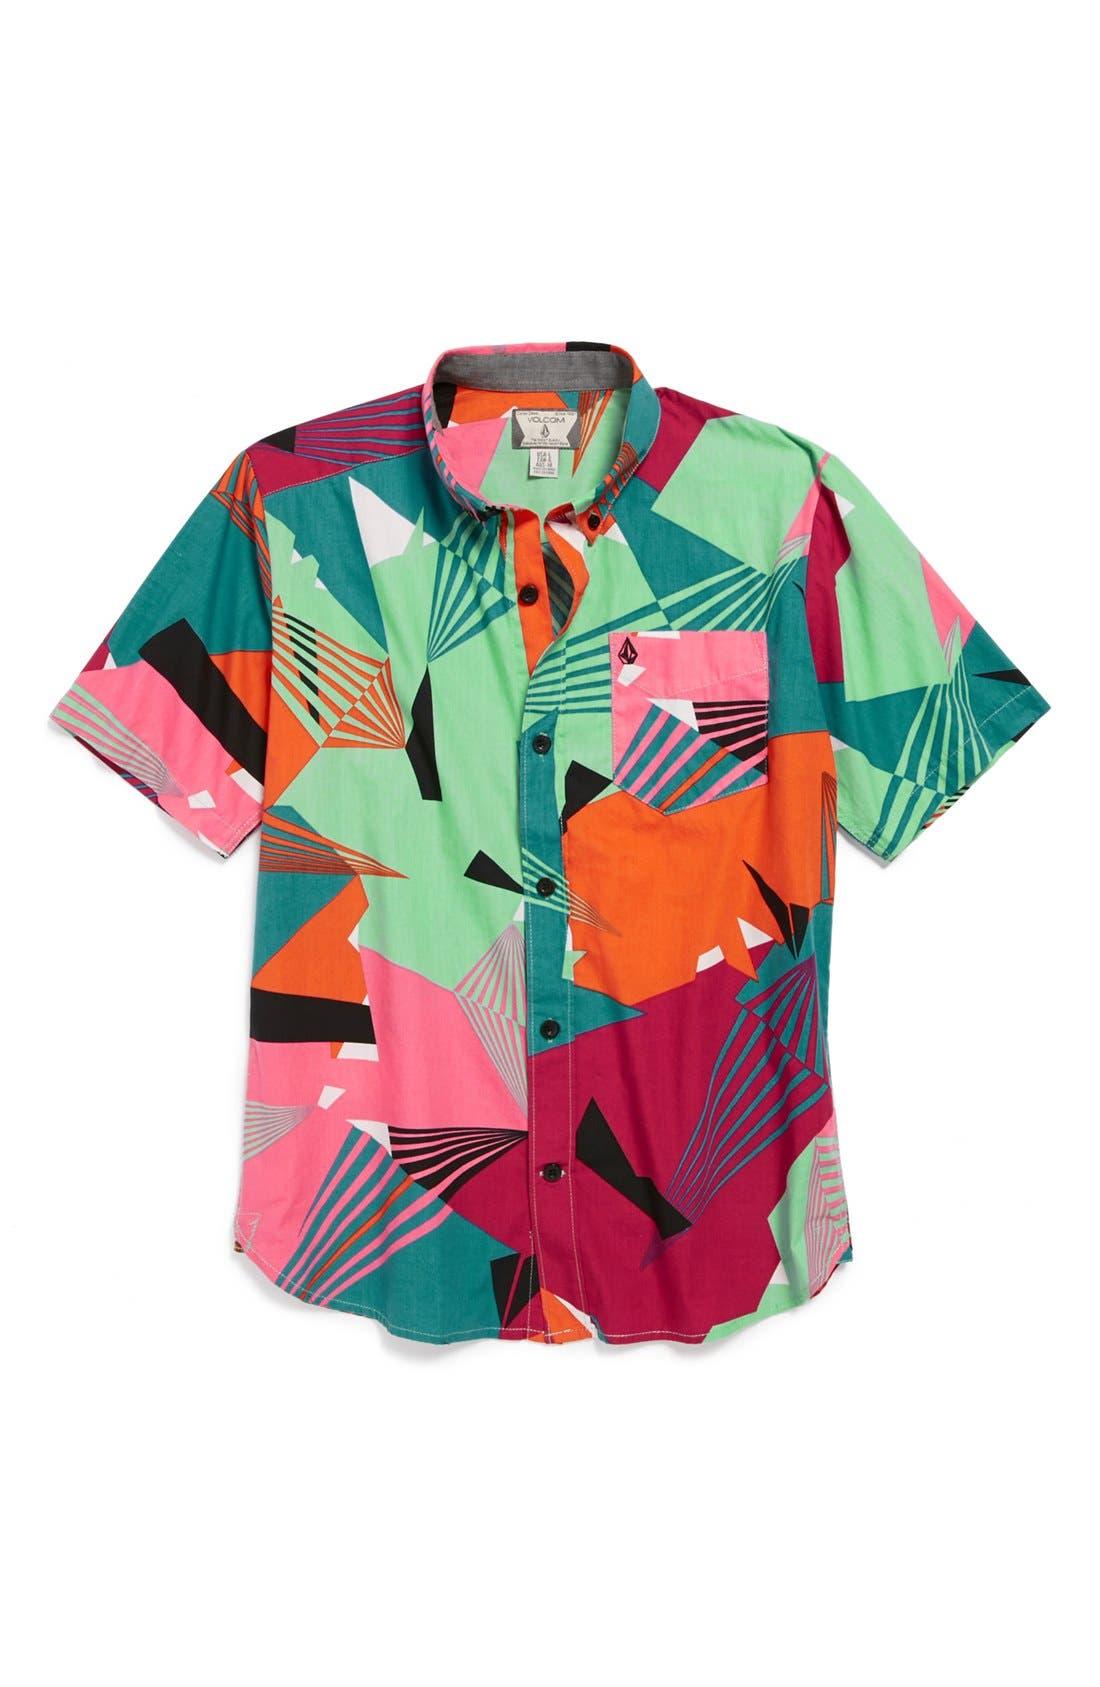 Alternate Image 1 Selected - Volcom 'Why Factor' Shirt (Big Boys)